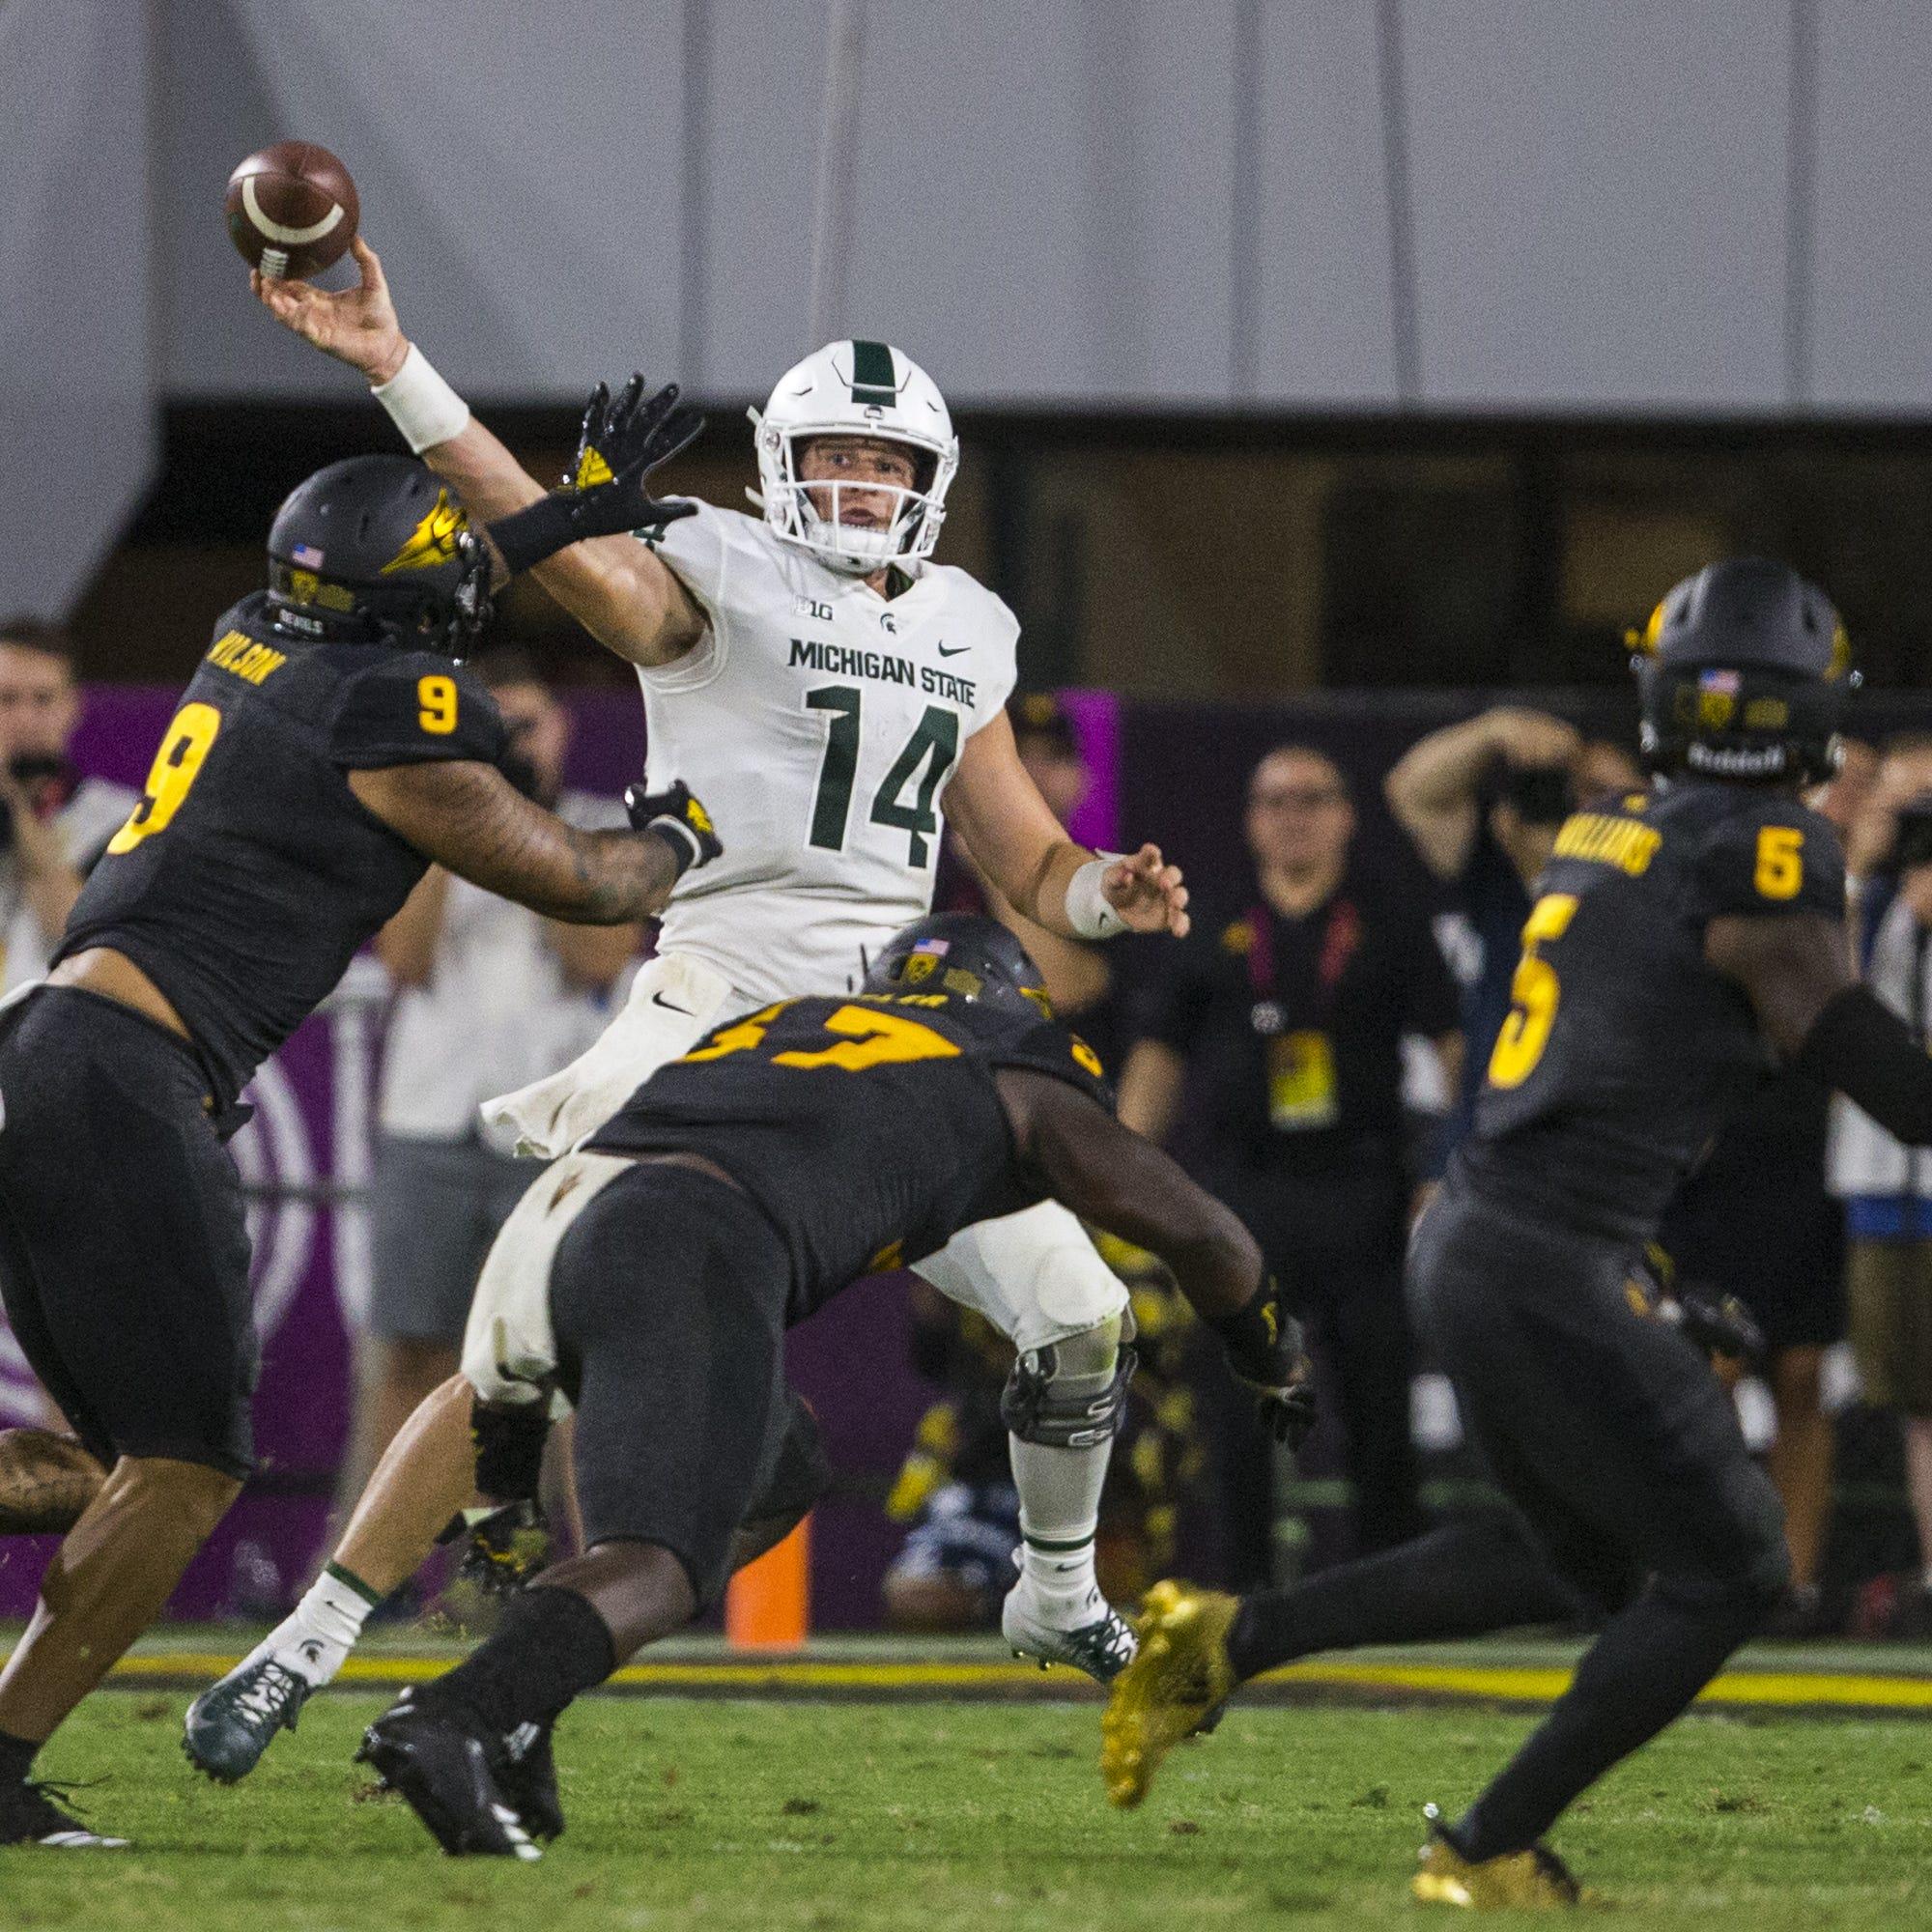 Michigan State's Brian Lewerke looks to pass against Arizona State in the 4th quarter on Saturday, Sept. 8, 2018, at Sun Devil Stadium in Tempe, Ariz. Arizona State won, 16-13.